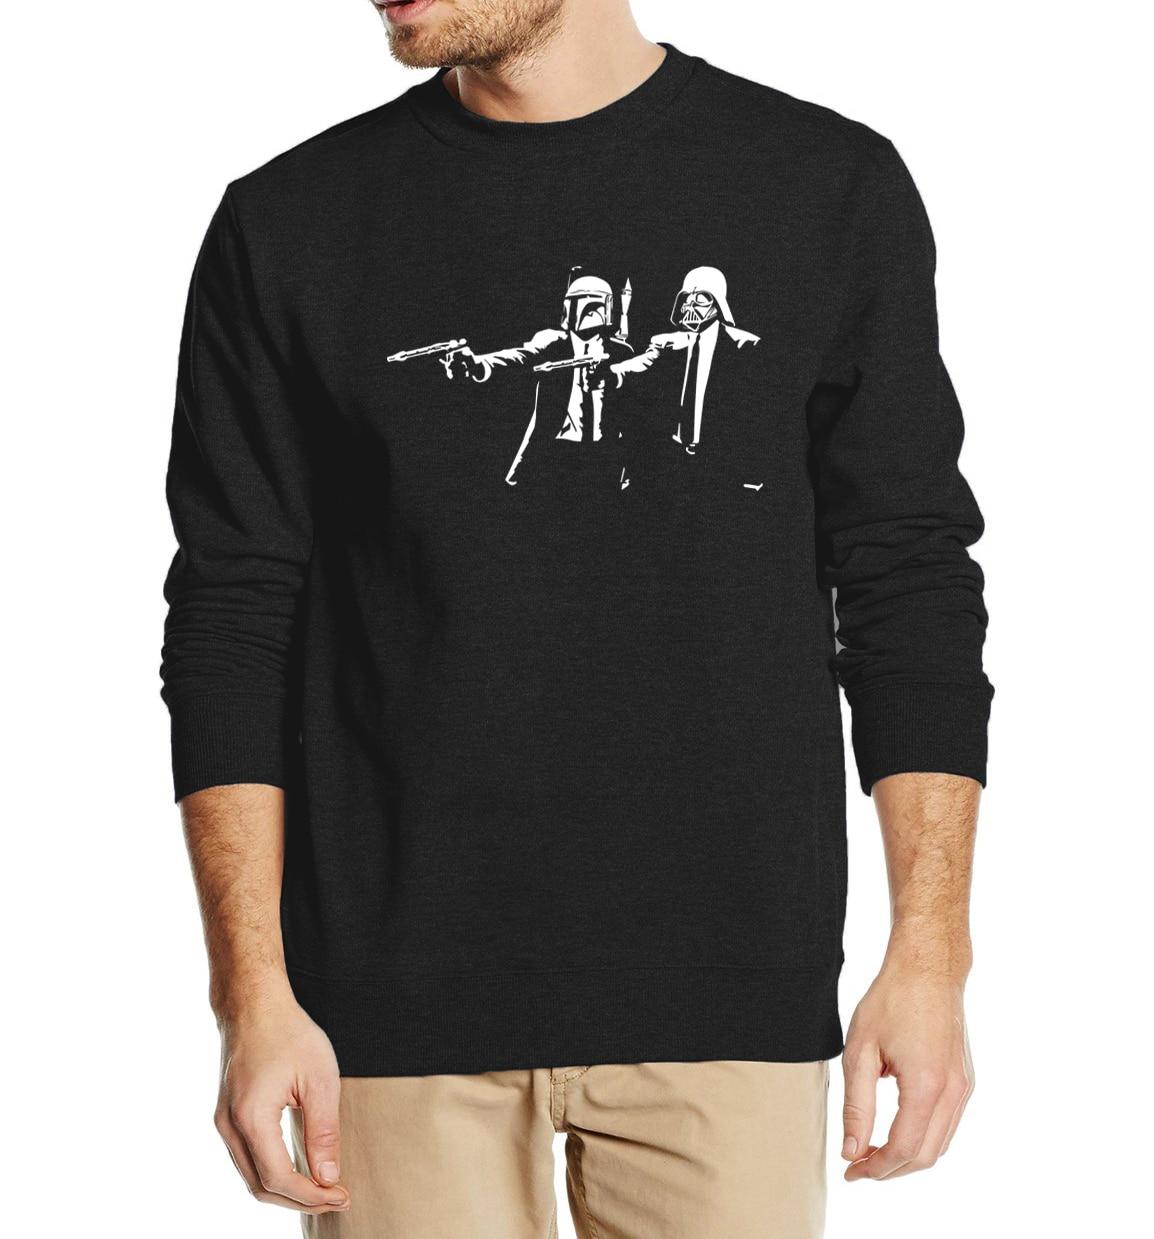 Cool Streetwear Banksy Star Wars 2019 Autumn Winter Fashion Men Sweatshirt Hoodies  Hip Hop Style Tracksuit High Quality